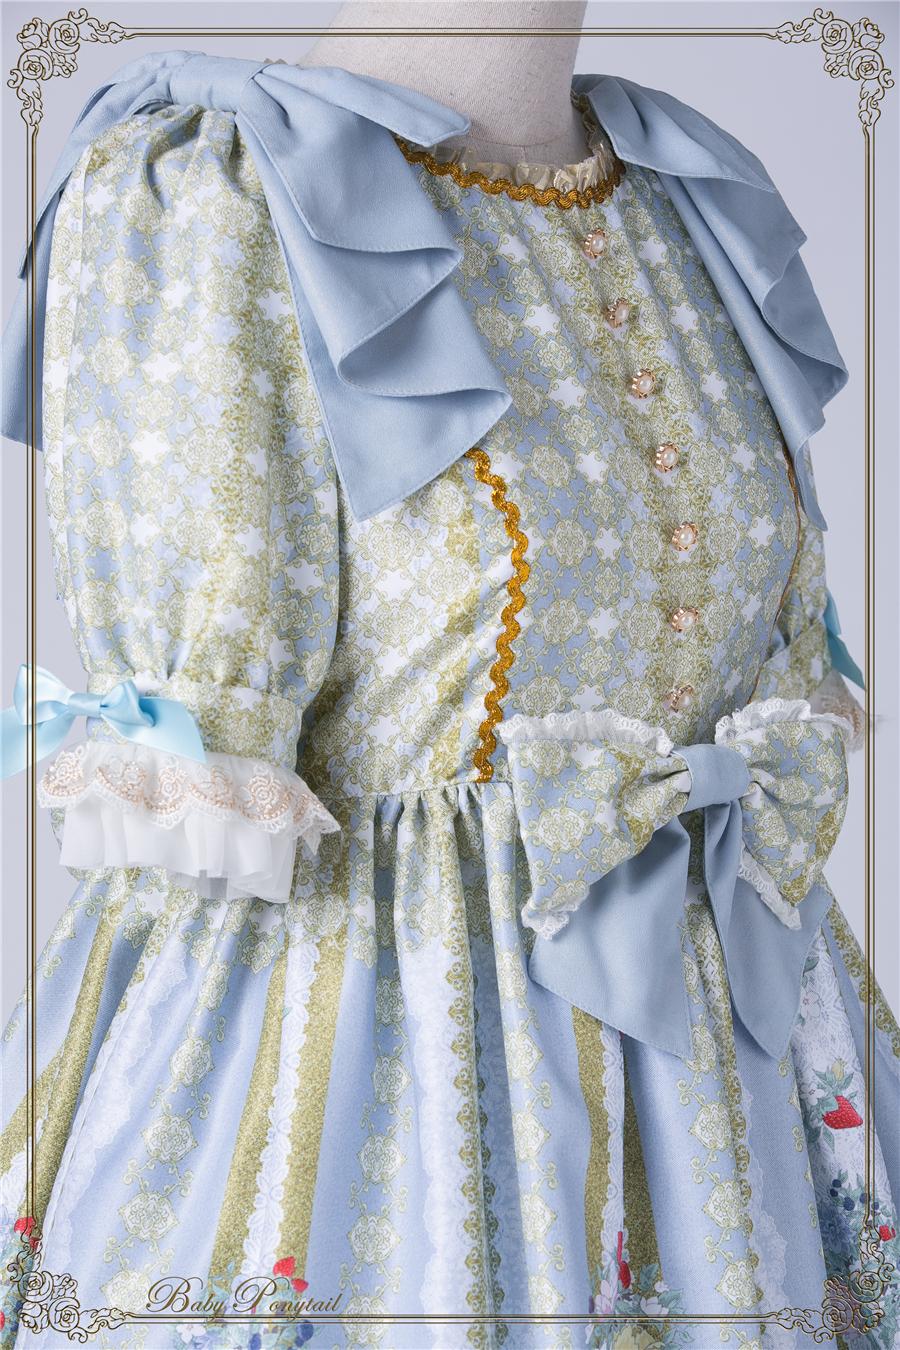 Baby Ponytail_Stock Photo_Rococo Bouquet_OP Sax_6.jpg